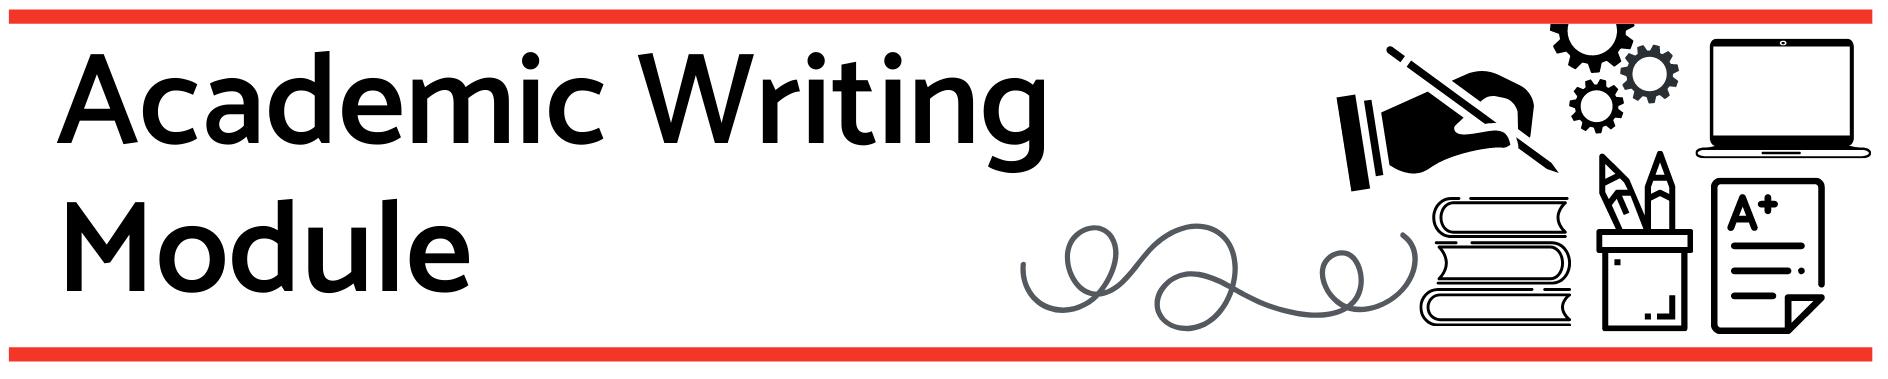 Academic writing banner